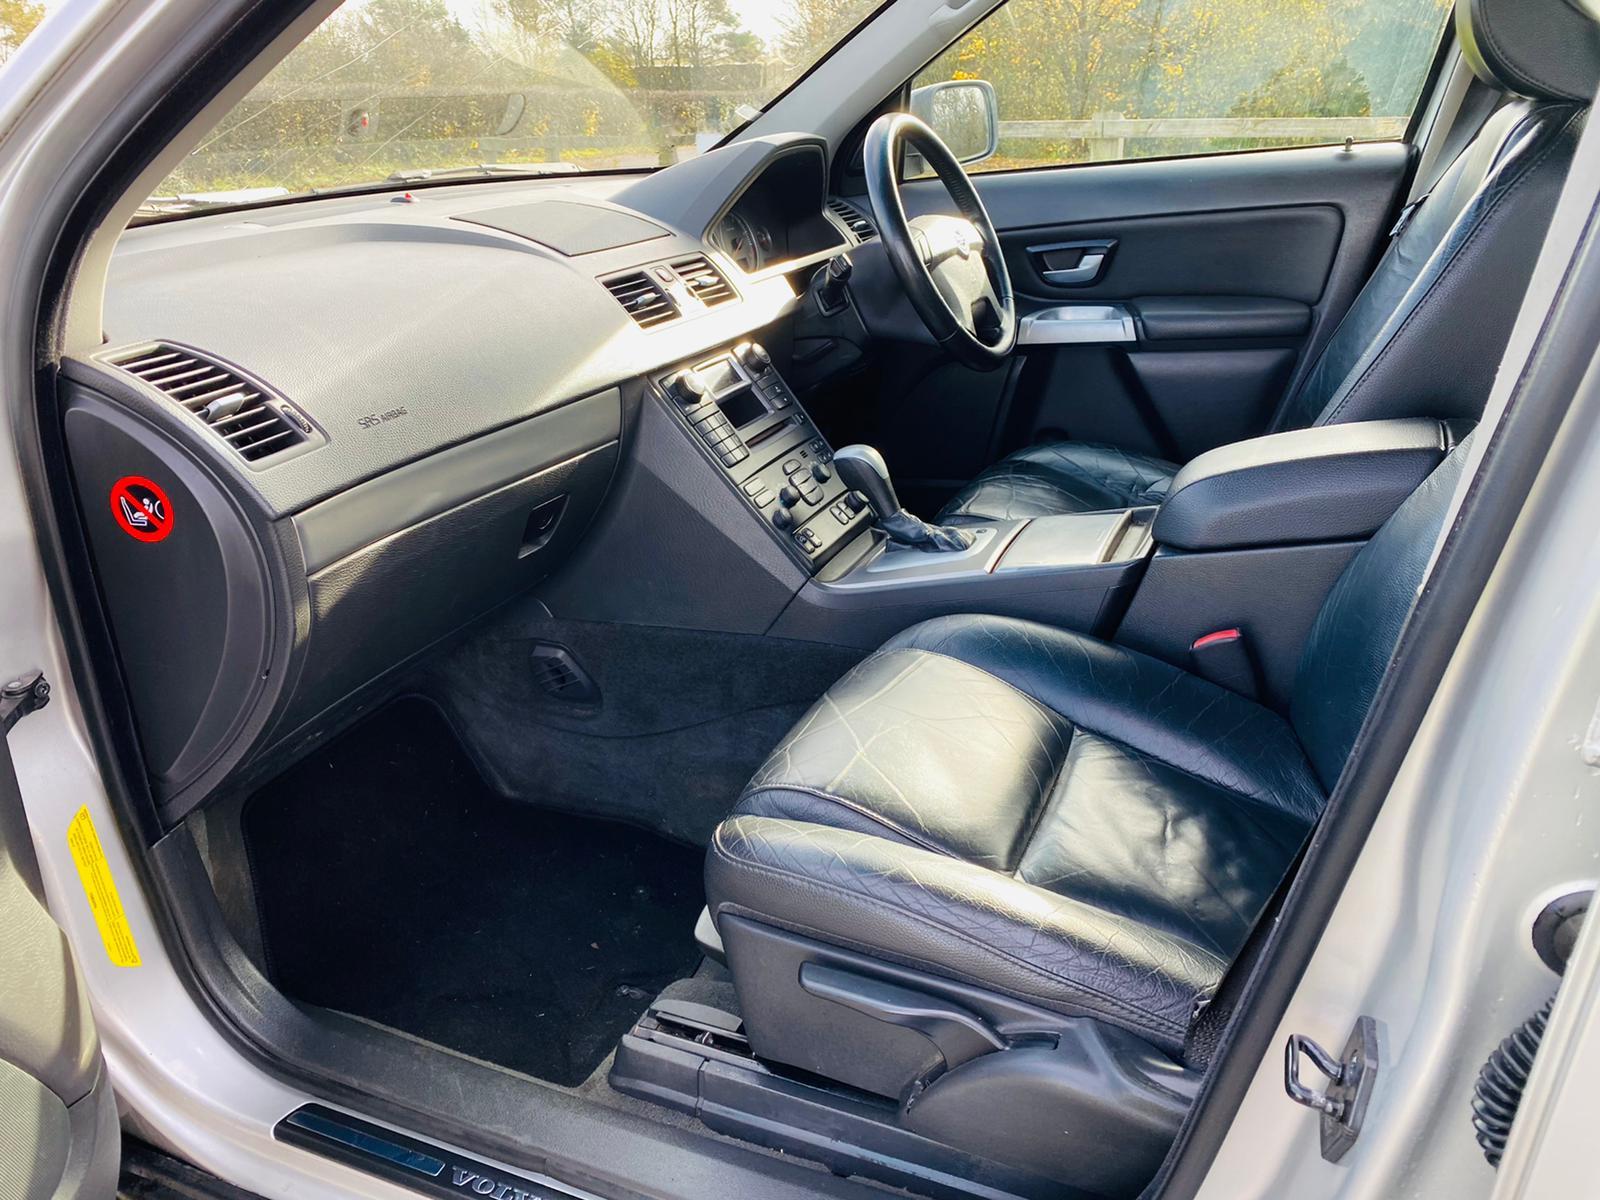 Volvo XC90 2.4 D5 185bhp SE Geartronic Auto 2006 06 Reg - 7 Seats - Air con - Top Spec - Image 34 of 47